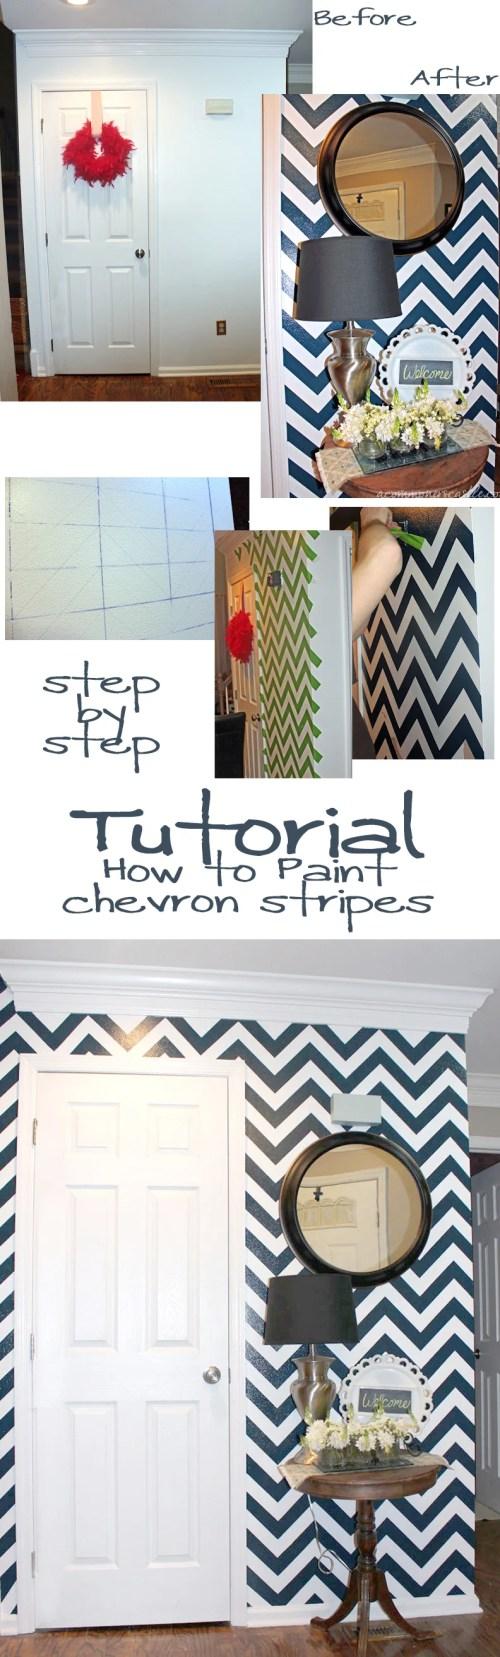 Chevron Stripe Painting Tutorial #chevron #stripe #painting #wall